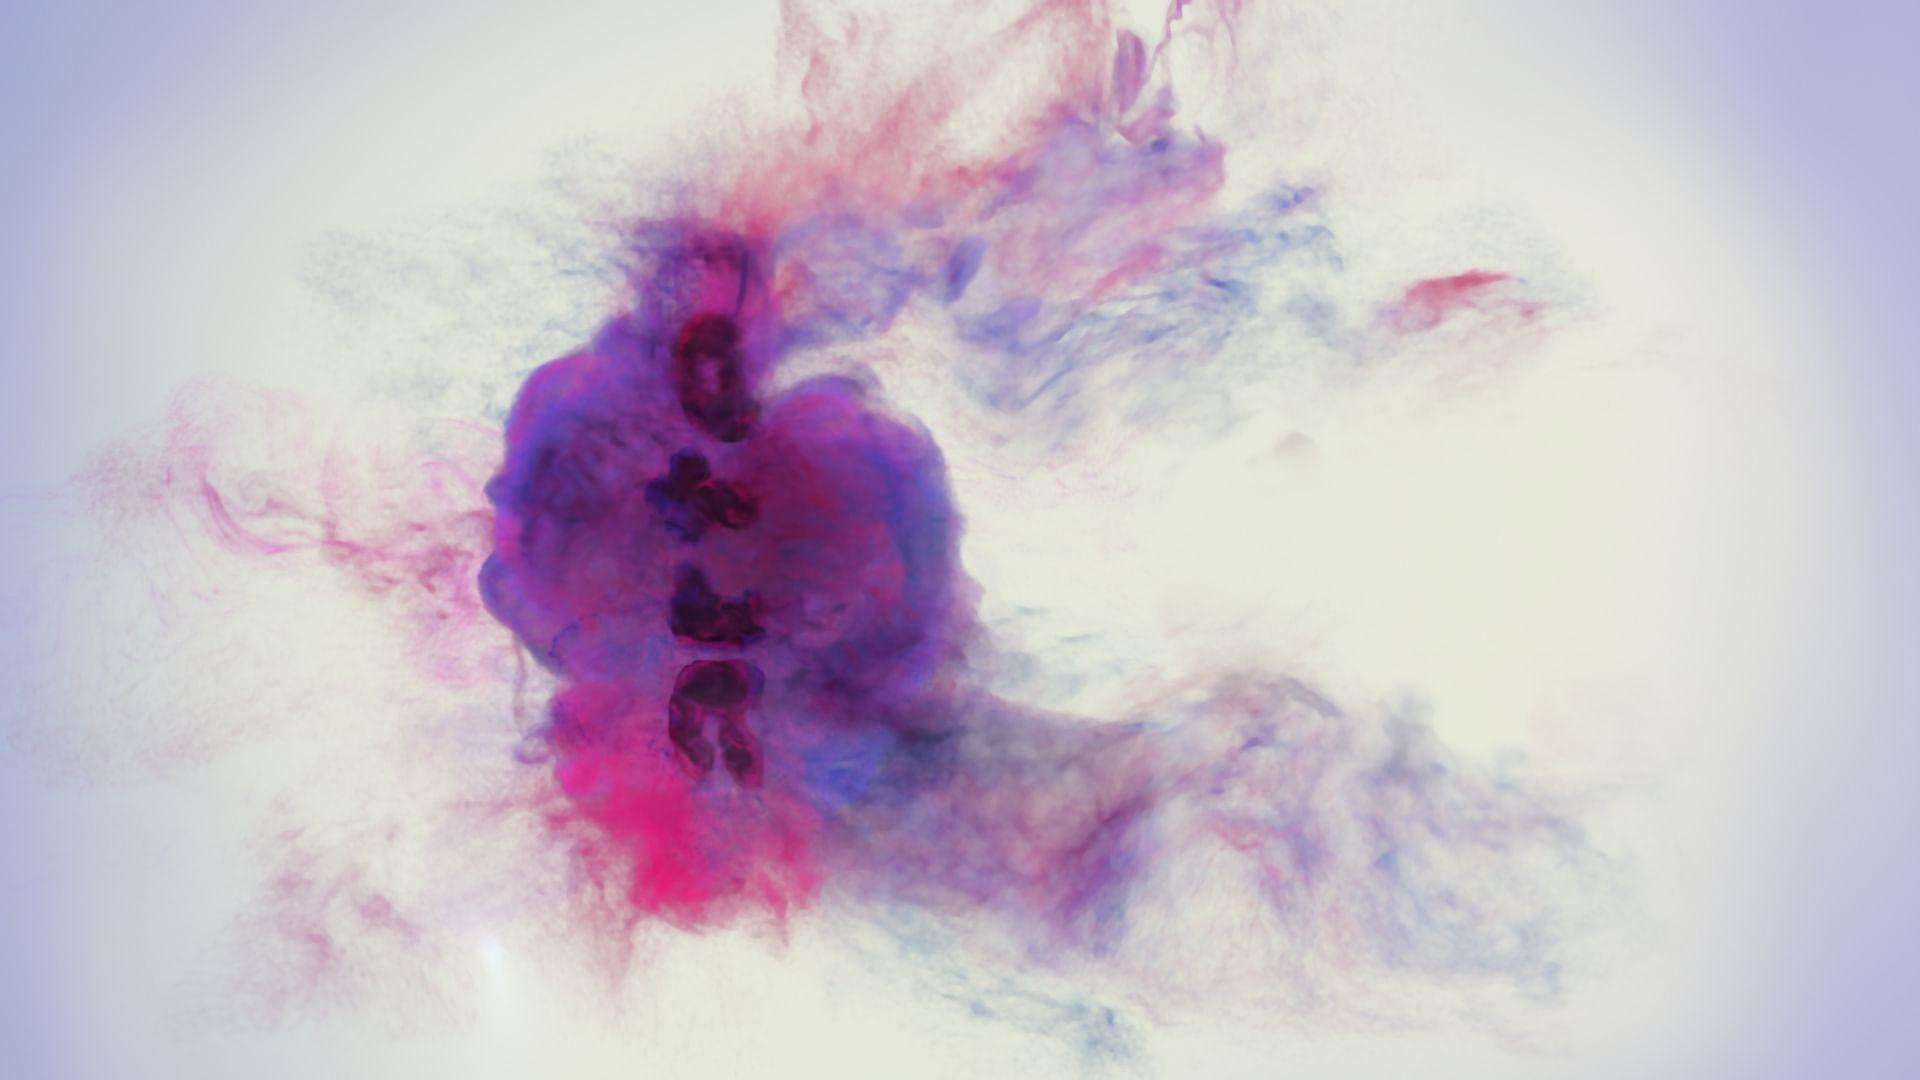 Tous Zombies (12/13) - Zombie Mainstream